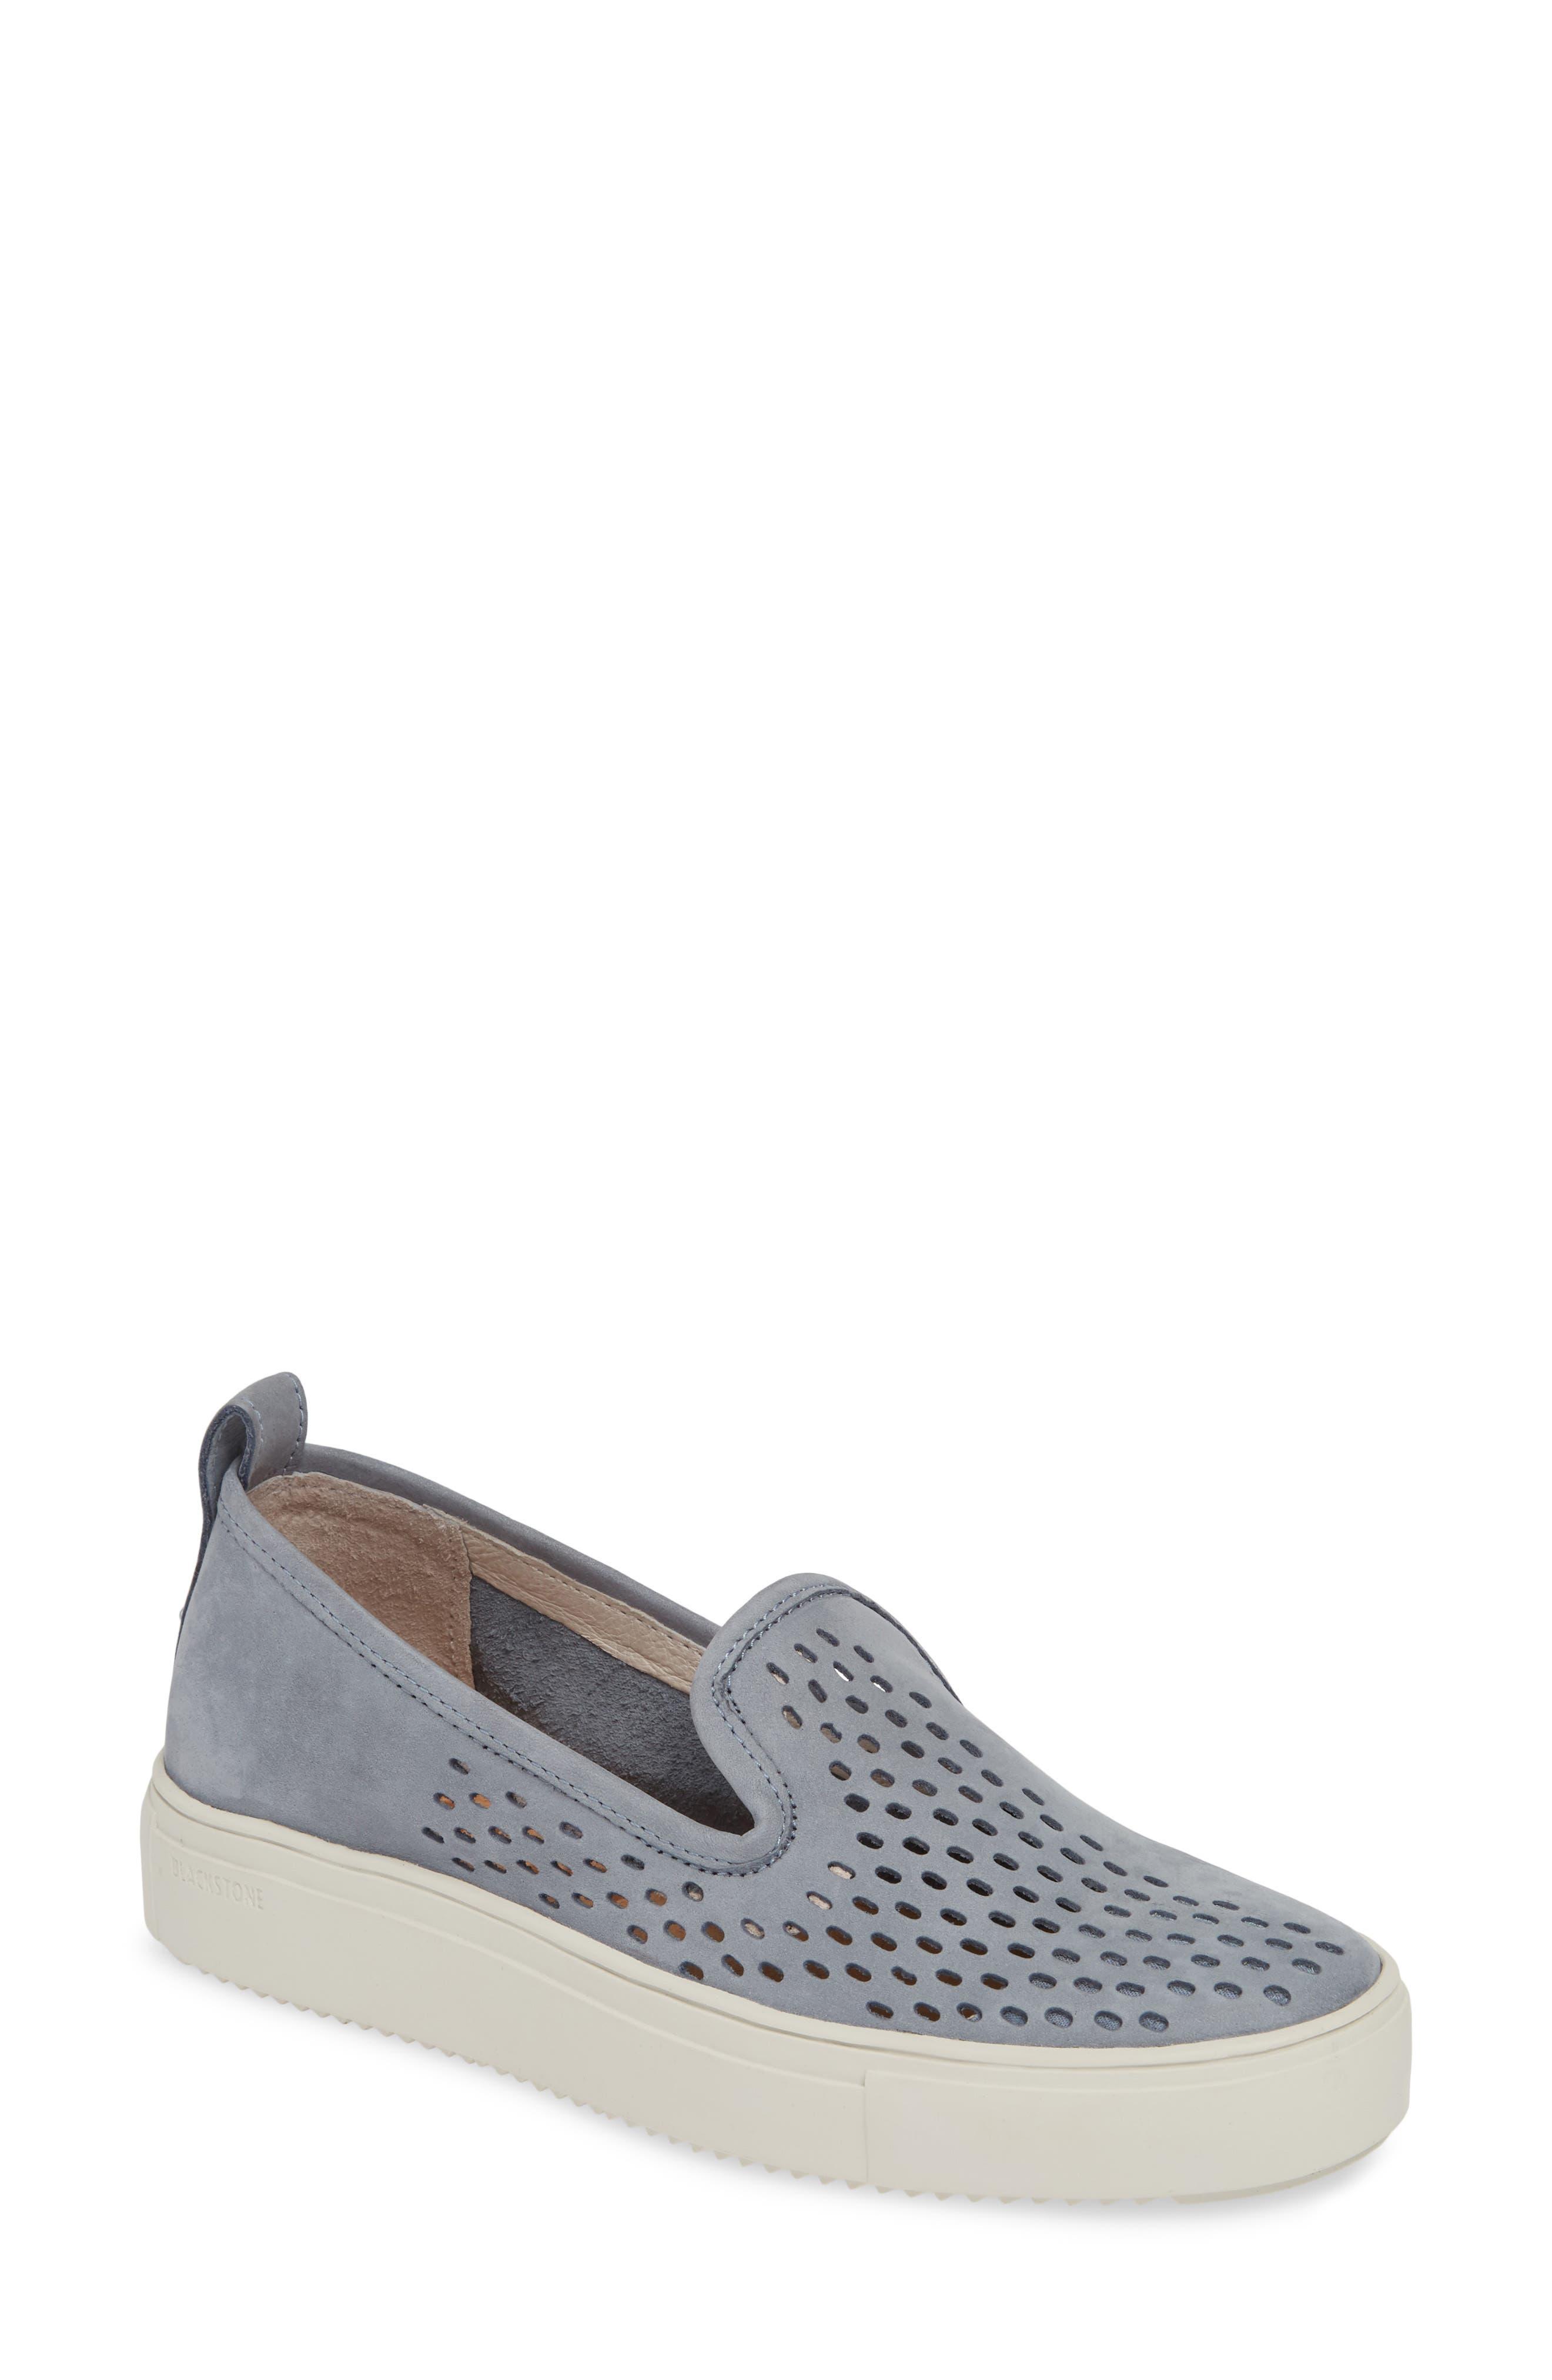 Blackstone Rl68 Perforated Slip-On Sneaker, Blue